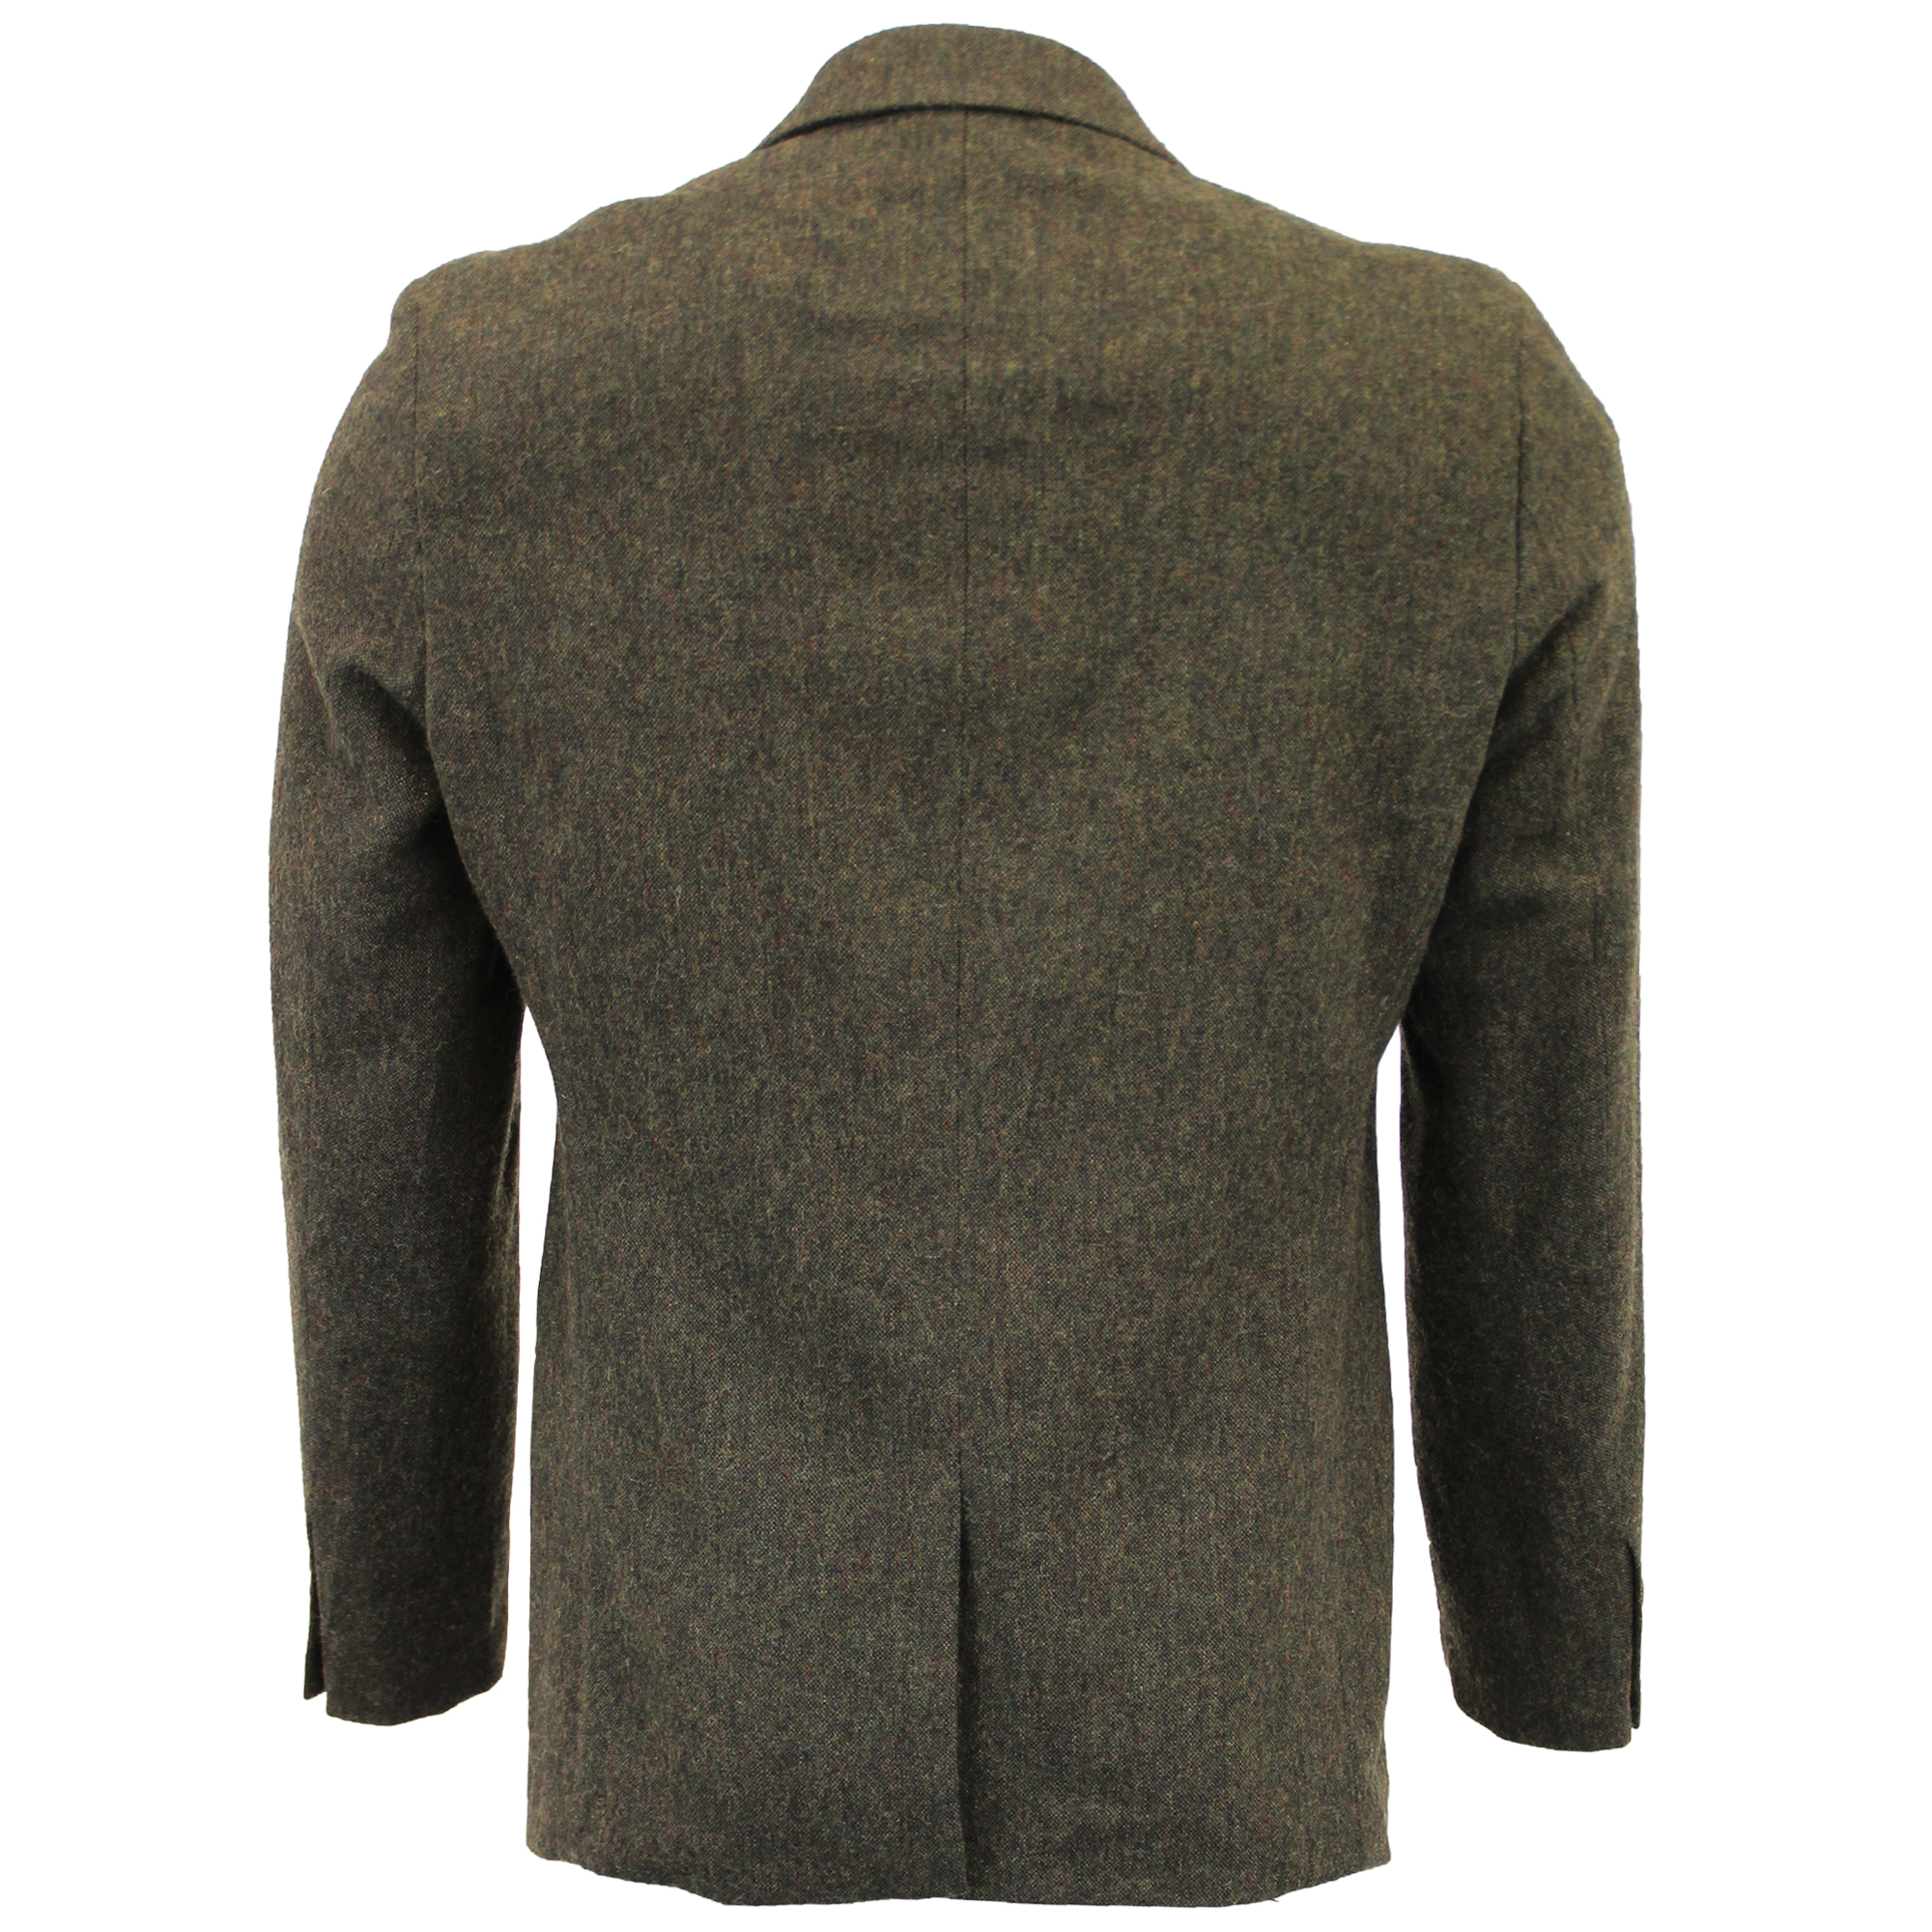 Mezcla-de-lana-para-hombre-3-piezas-trajes-mareno-Blazer-Chaqueta-pantalones-chaleco-Fiesta-Formal miniatura 17